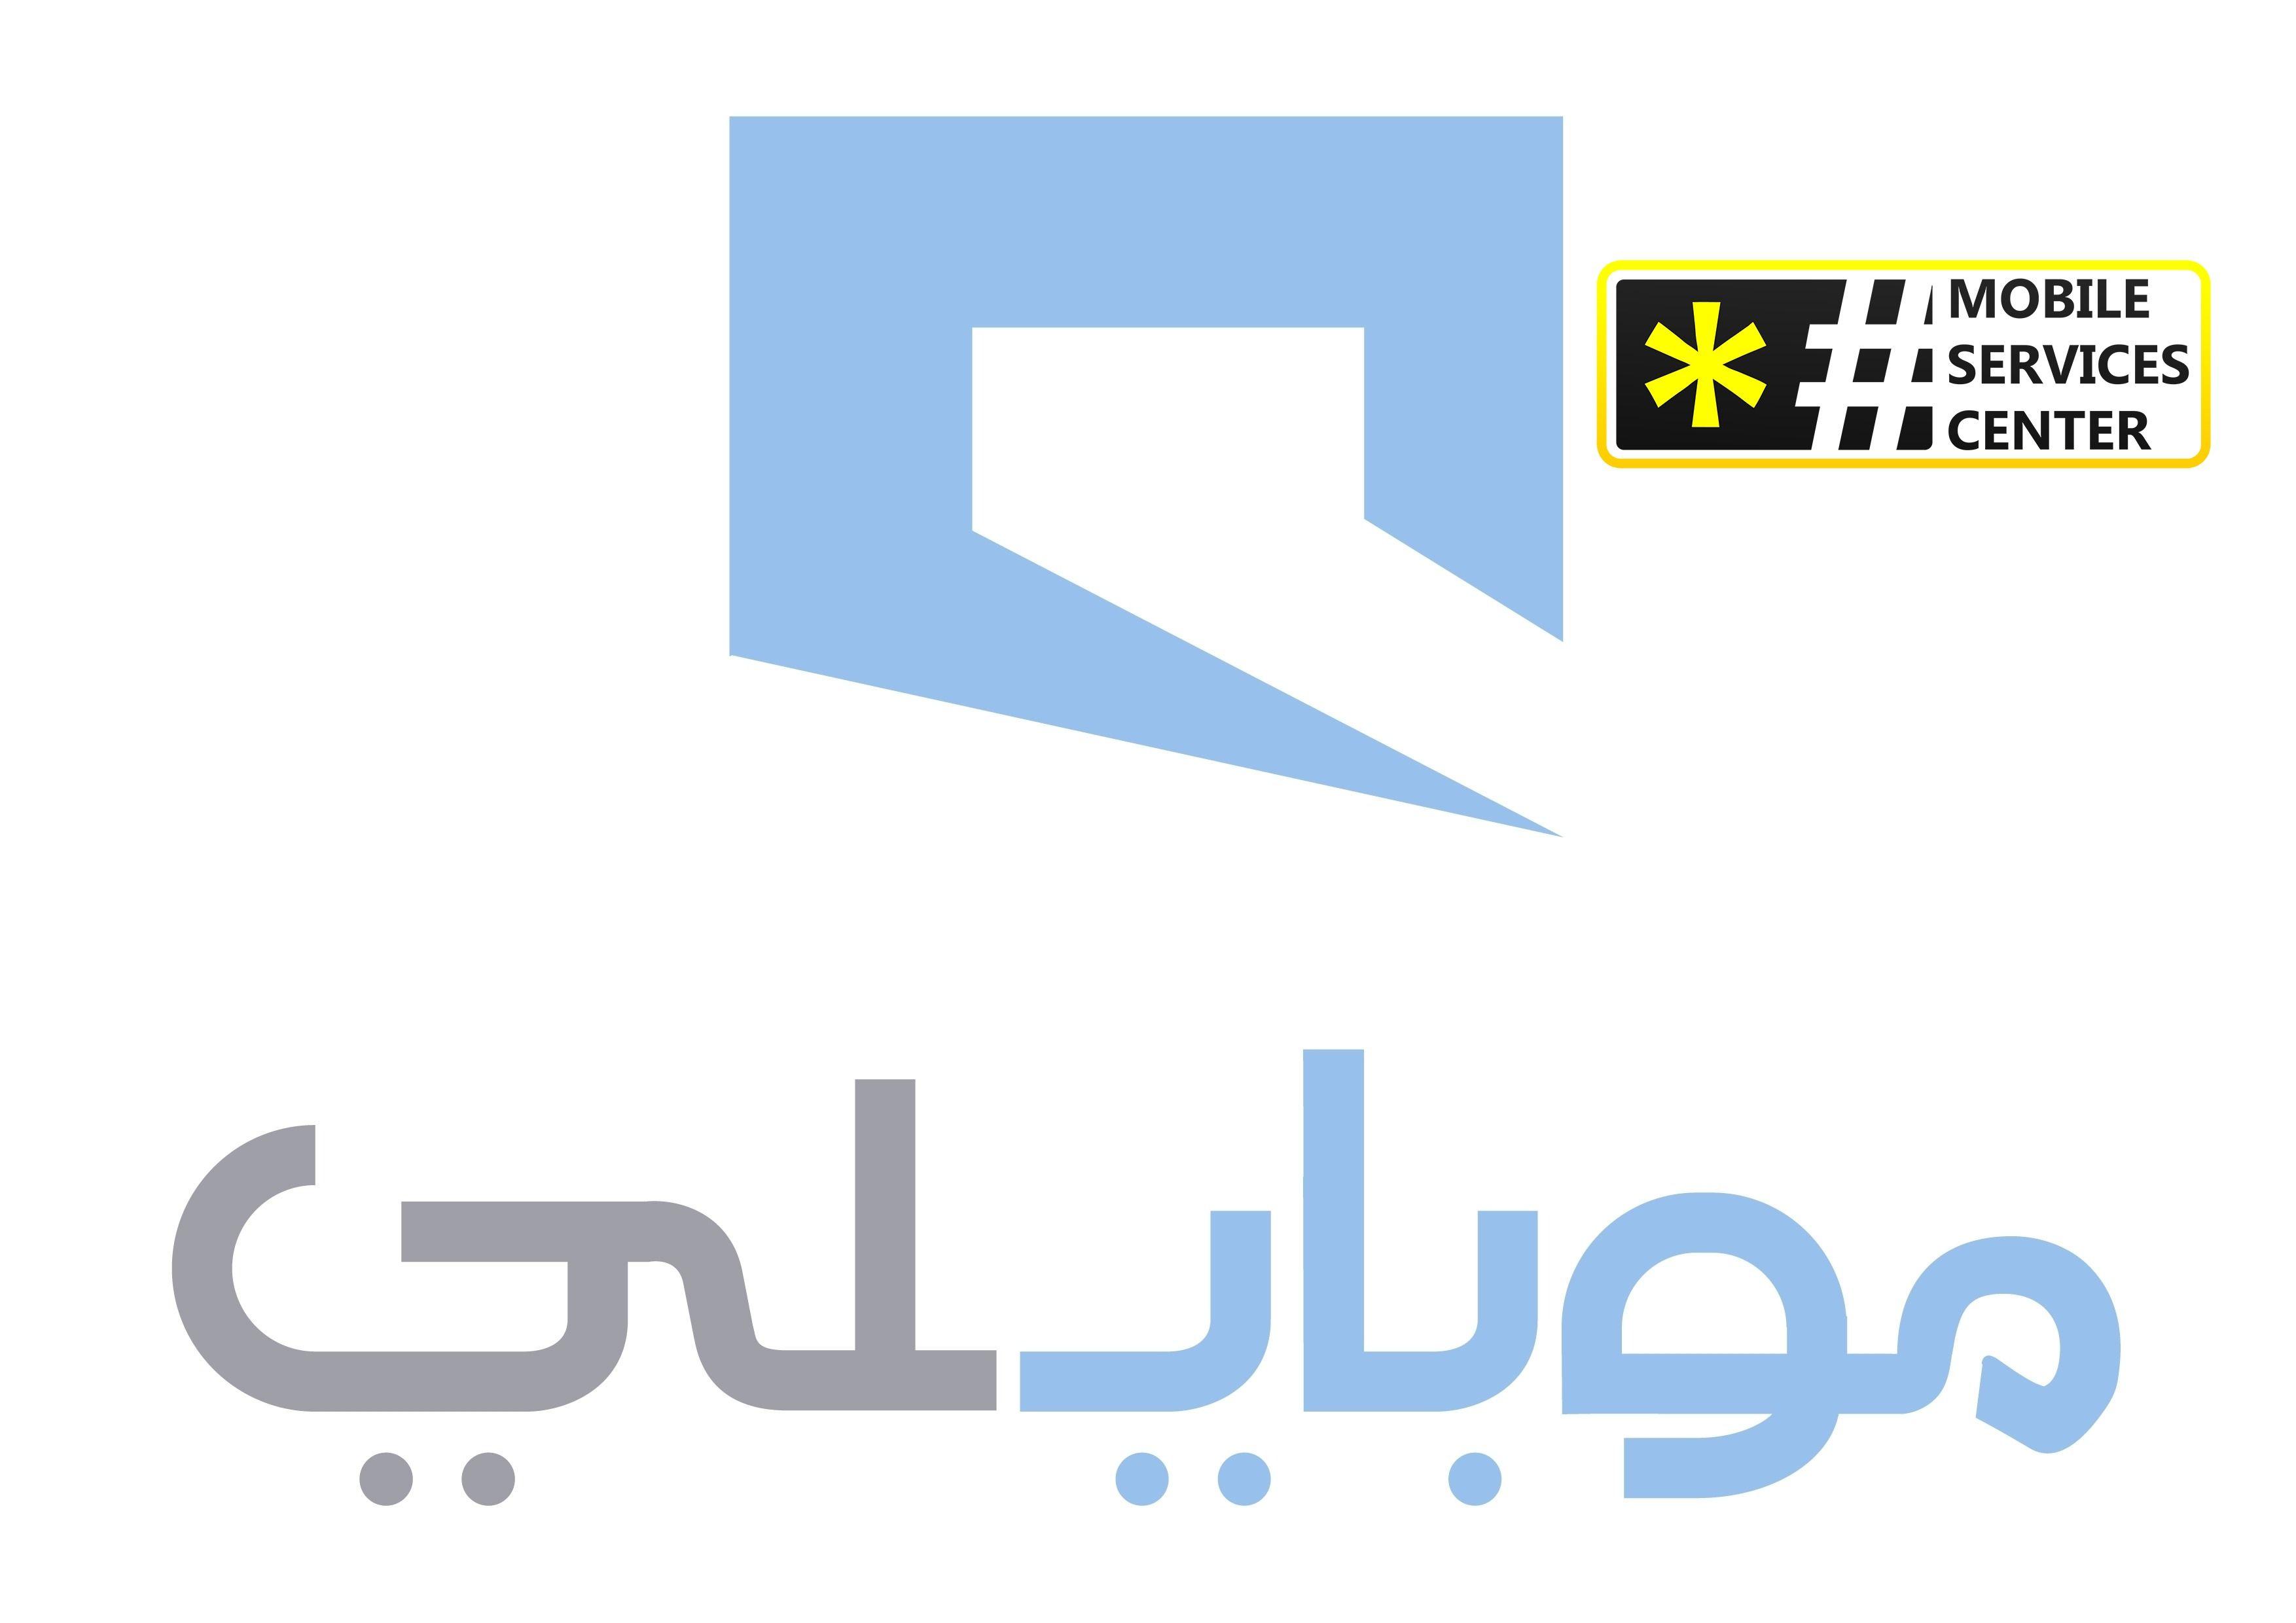 كيف أرسل كول مي موبايلي Tech Company Logos Company Logo Ibm Logo